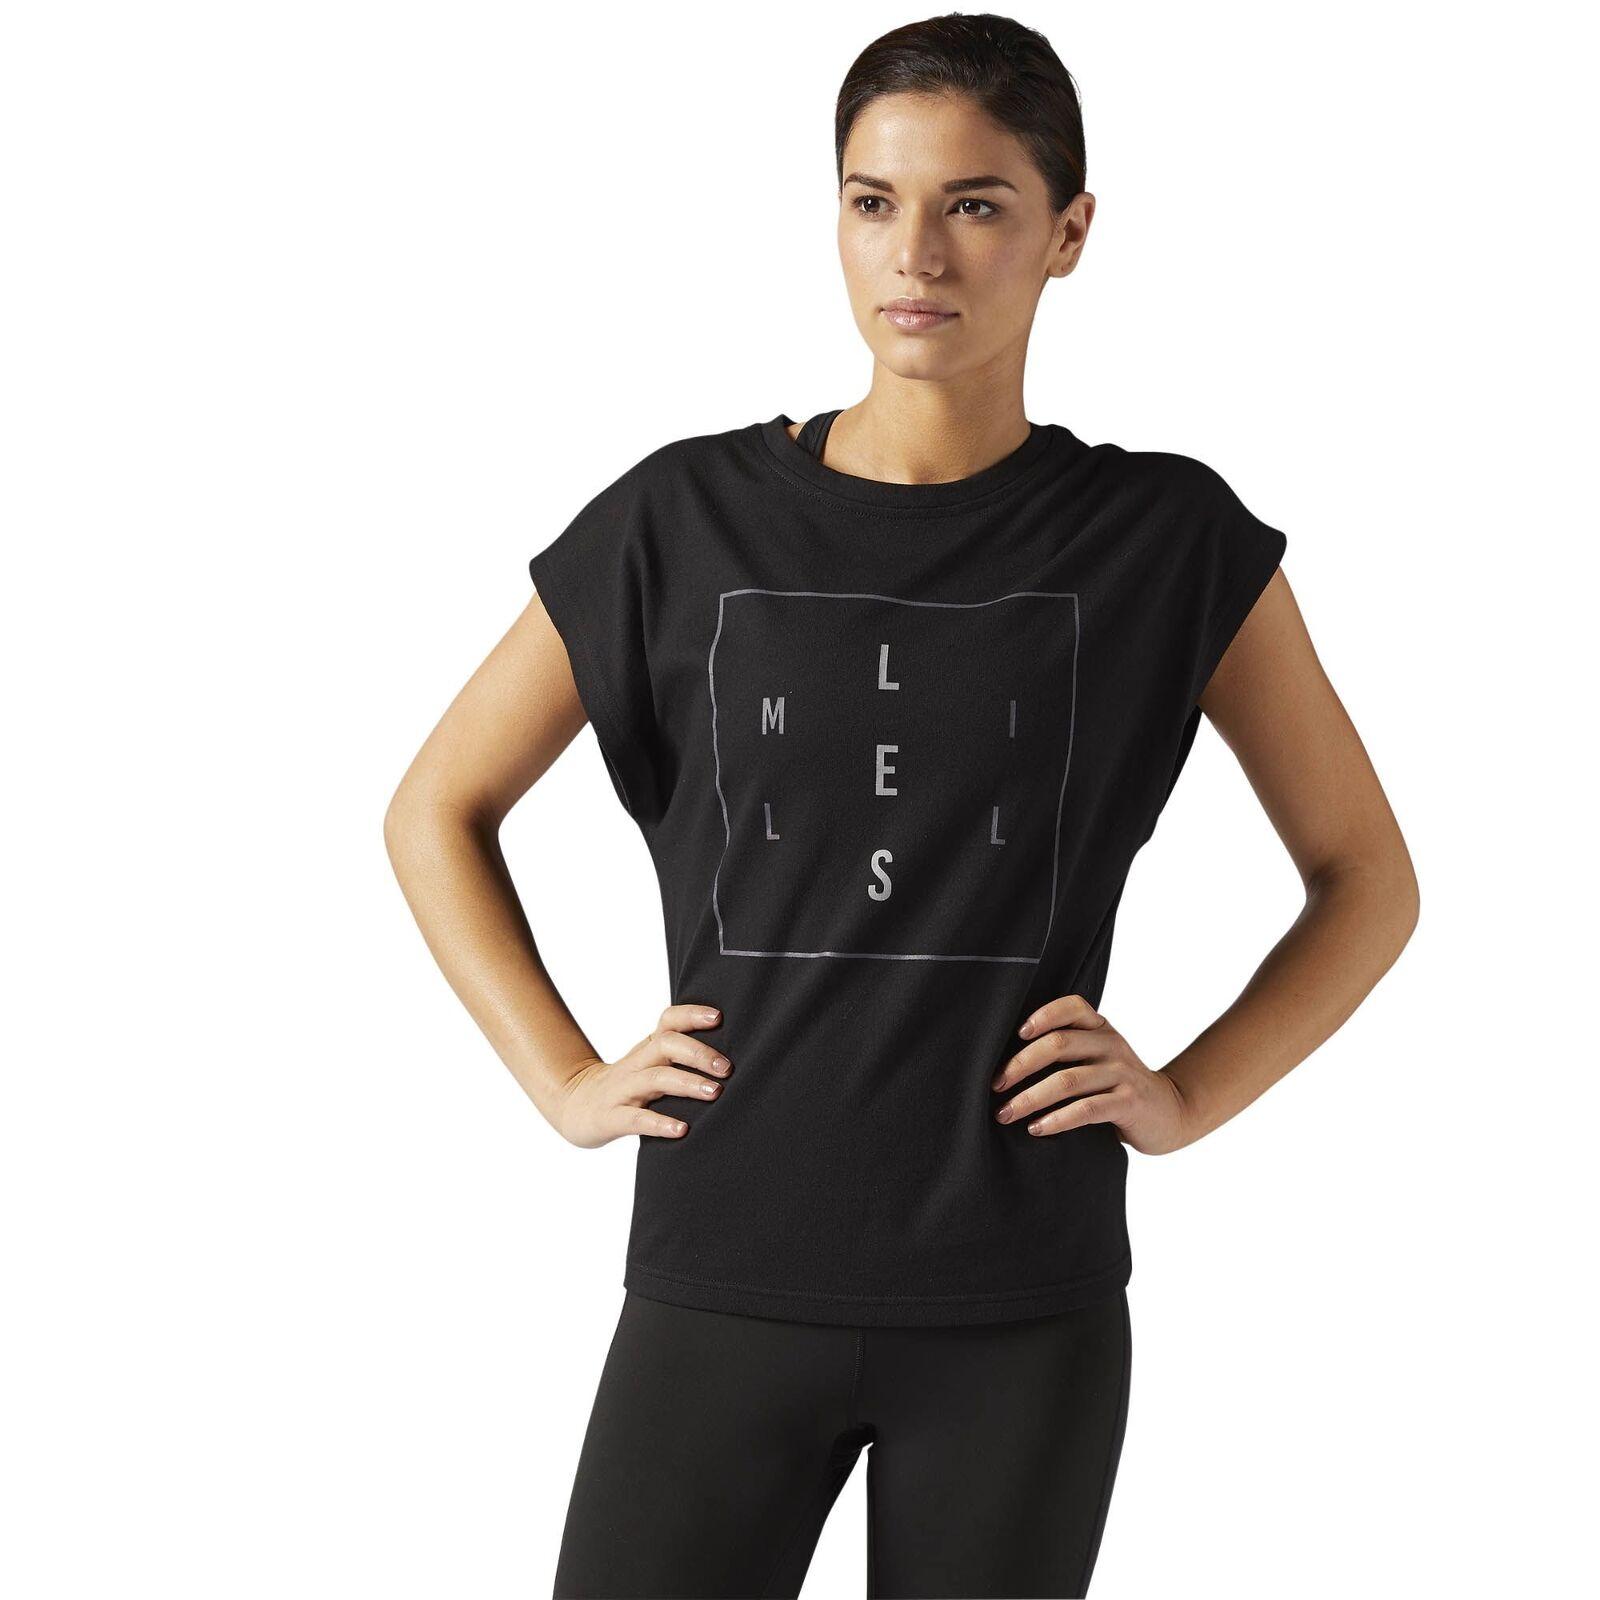 Reebok Lm Tee camiseta de mujer deportiva fitnessshirt entrenamiento